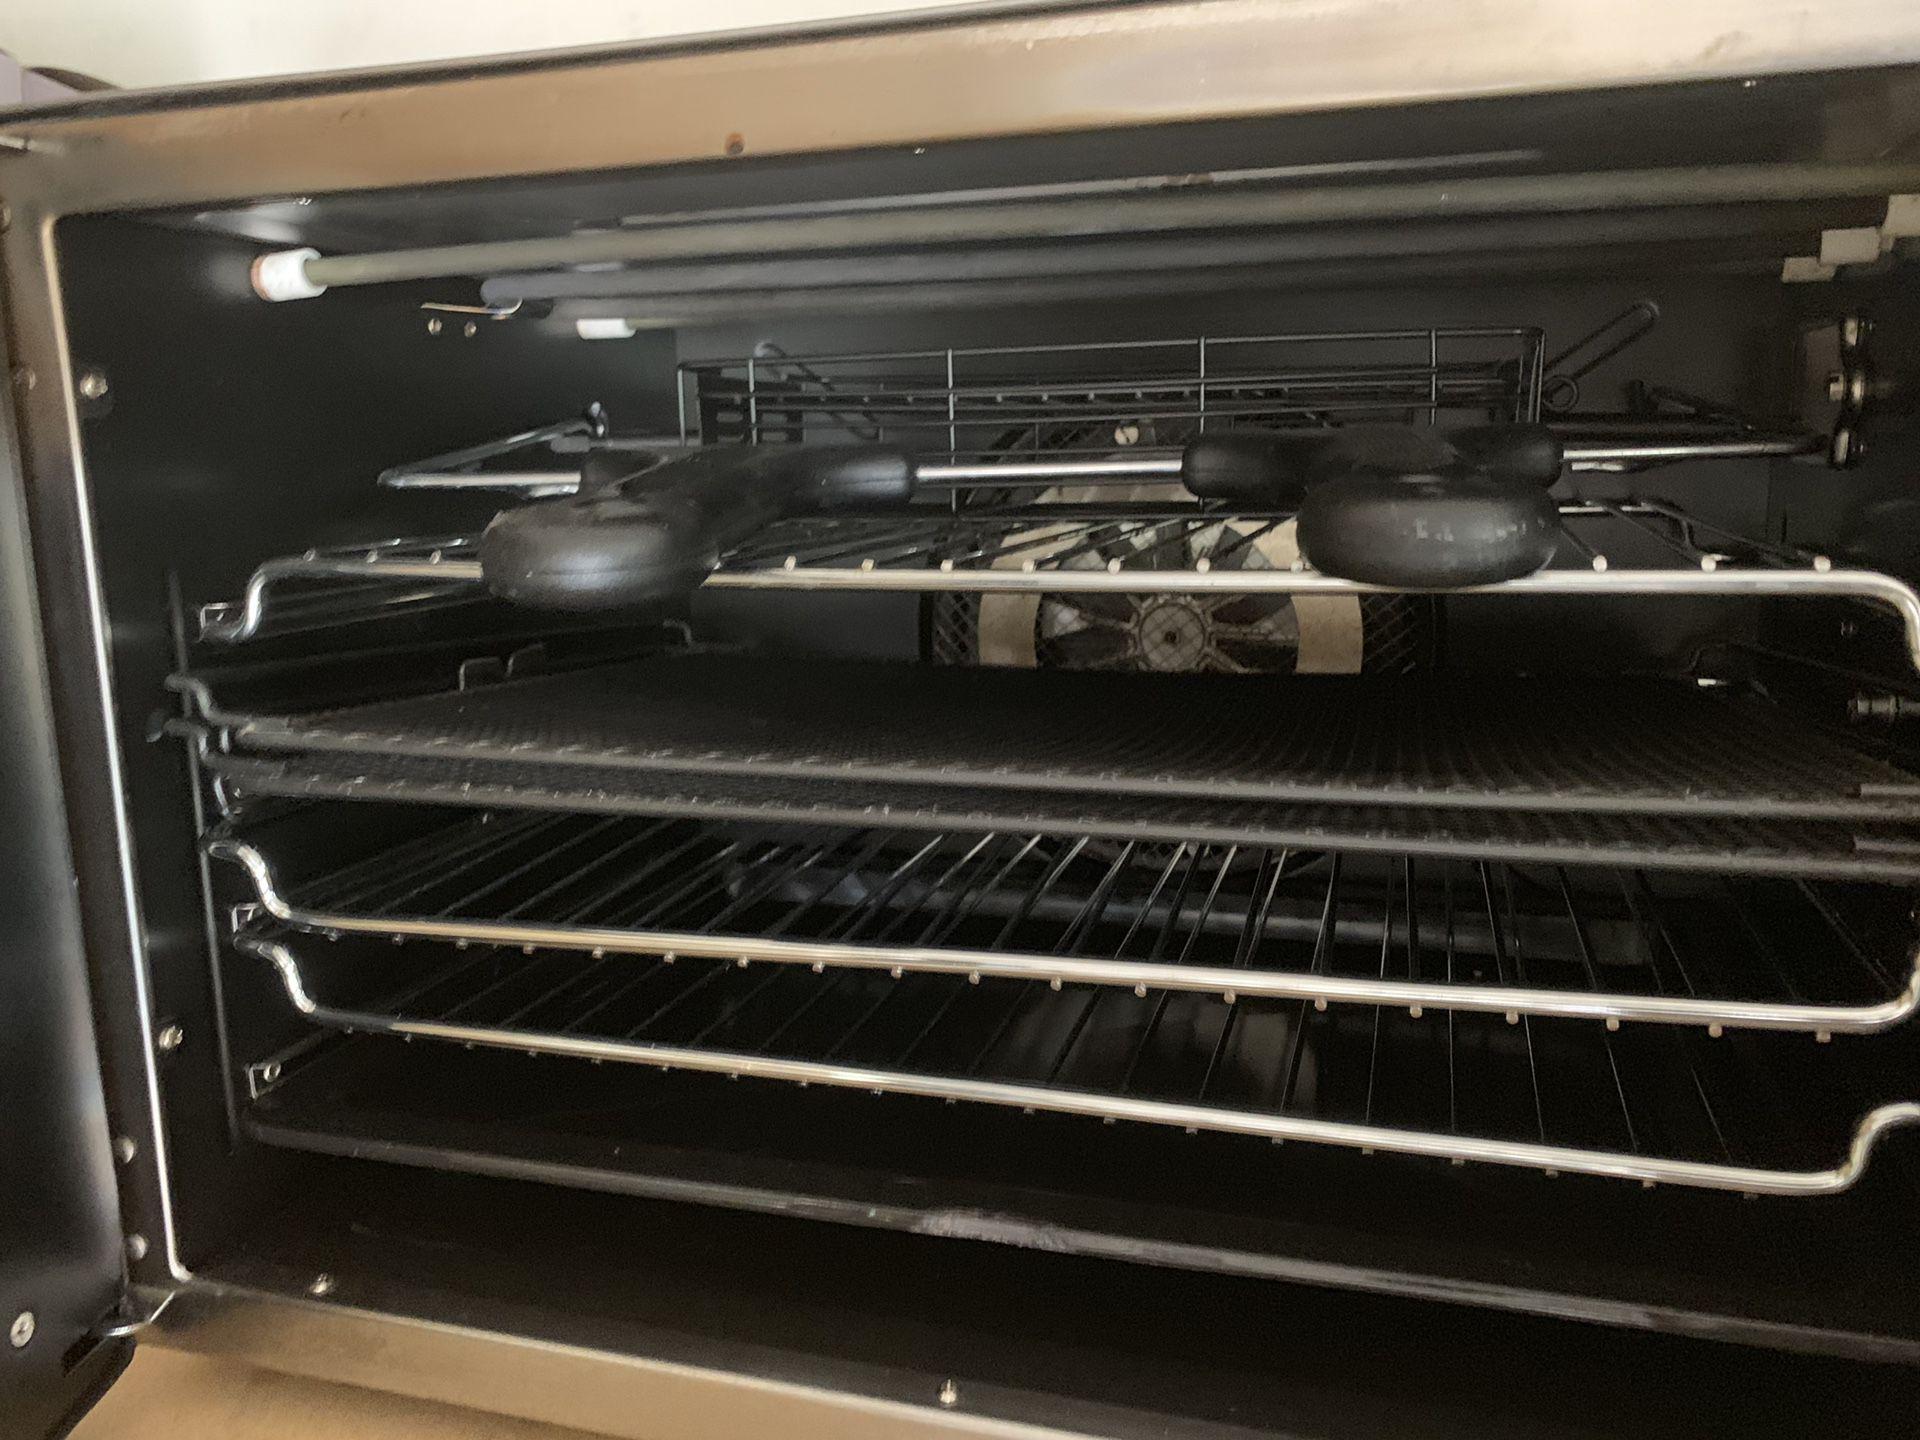 Portable oven